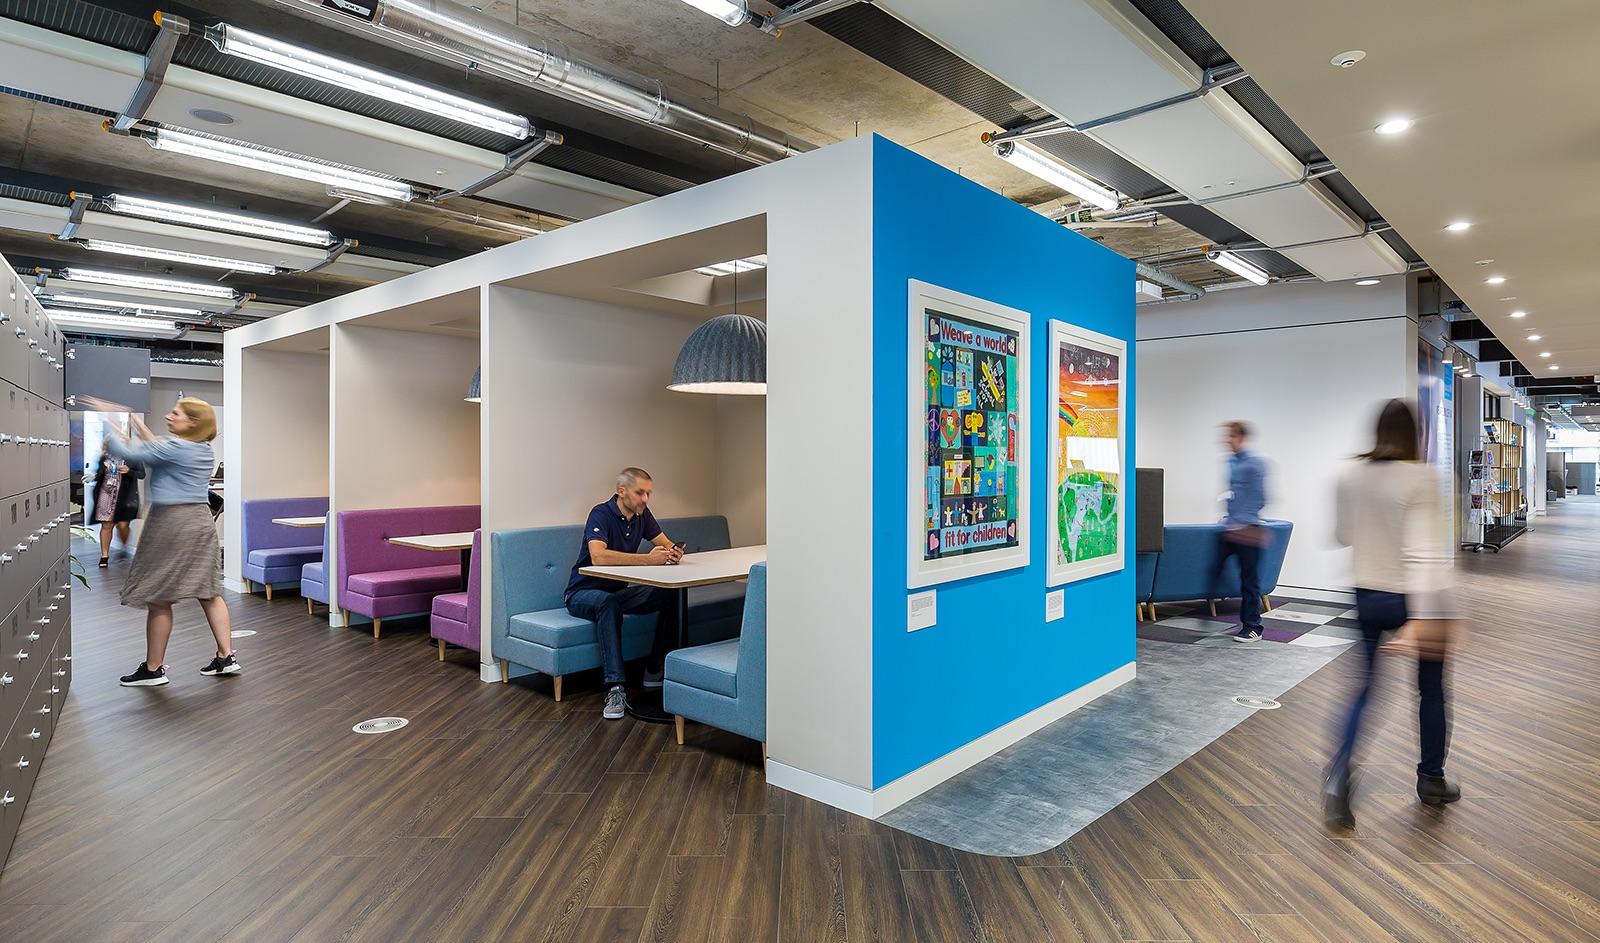 unicef-london-office-6